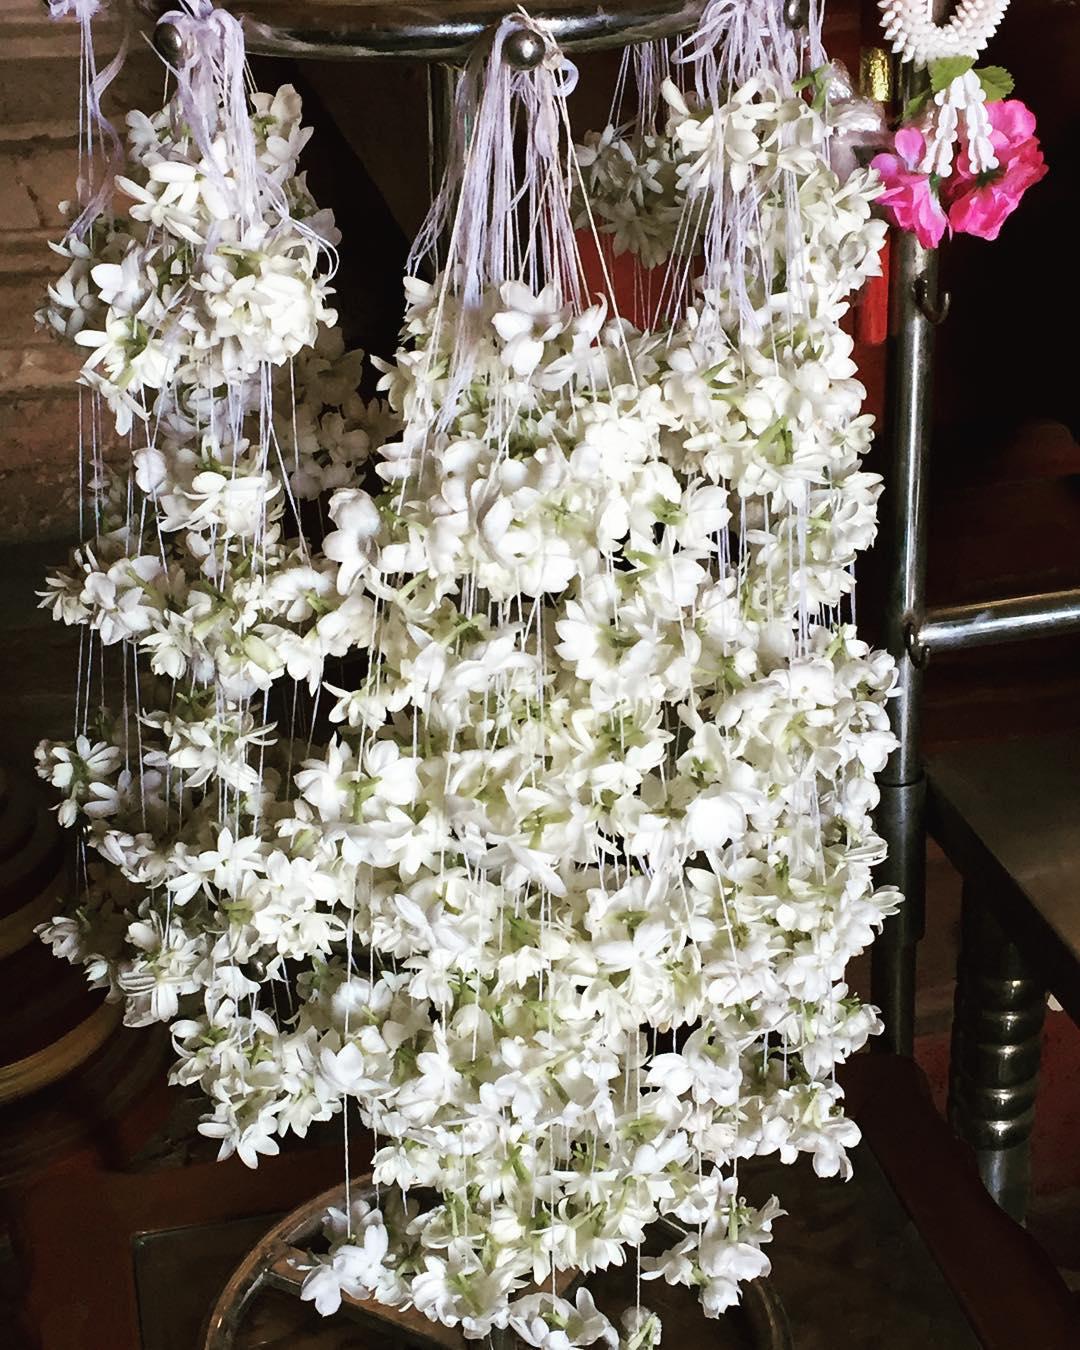 Blancos deseos #benga #trippingmood #bagan #myanmar